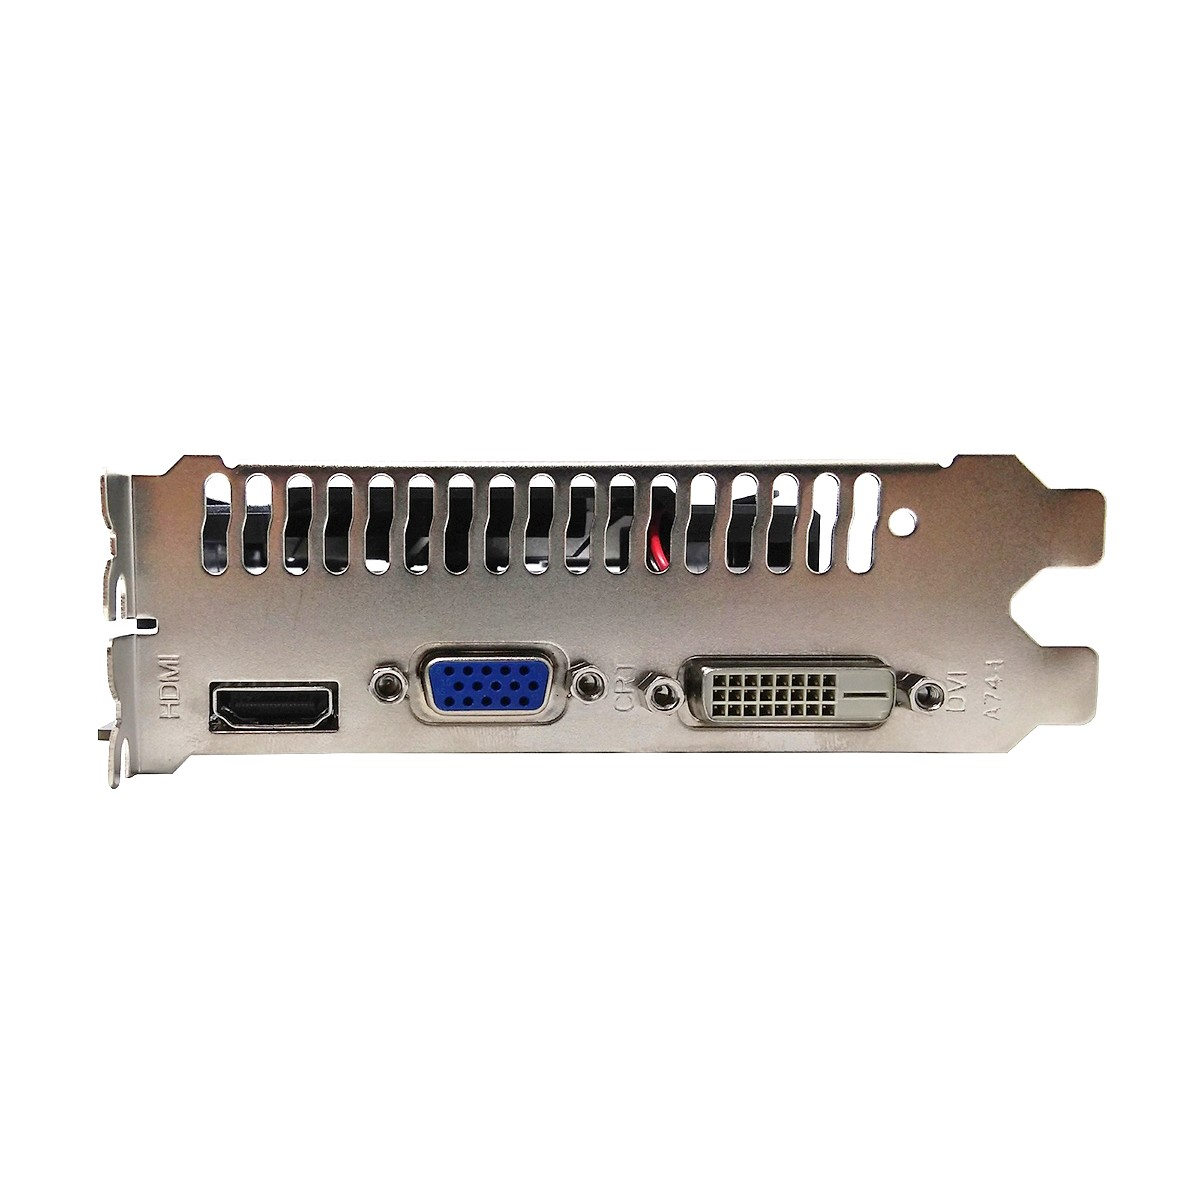 Placa de Vídeo Afox GTX 750TI, 2GB, GDDR5, 128bit, AF750TI-2048D5H3-V2